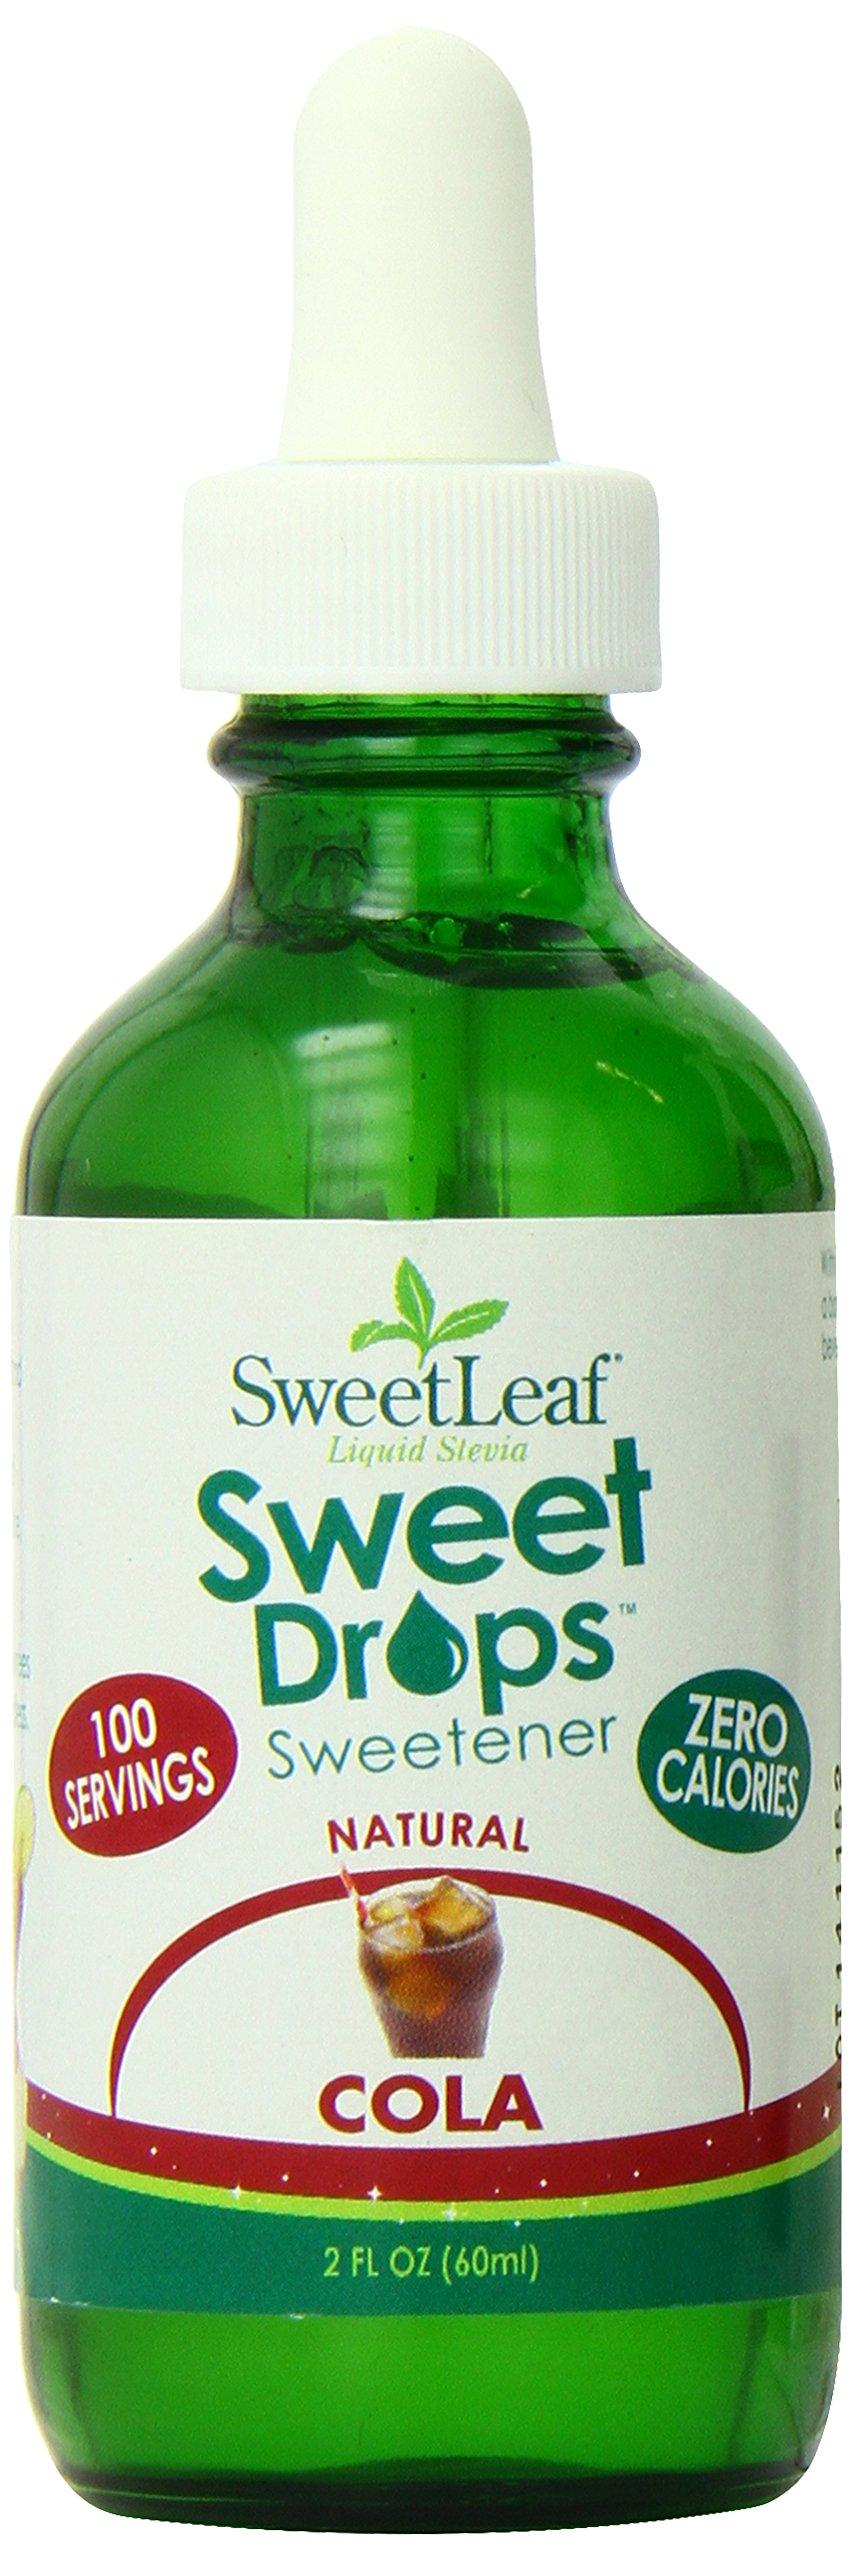 SweetLeaf Sweet Drops Liquid Stevia Sweetener, Cola, 2 Ounce